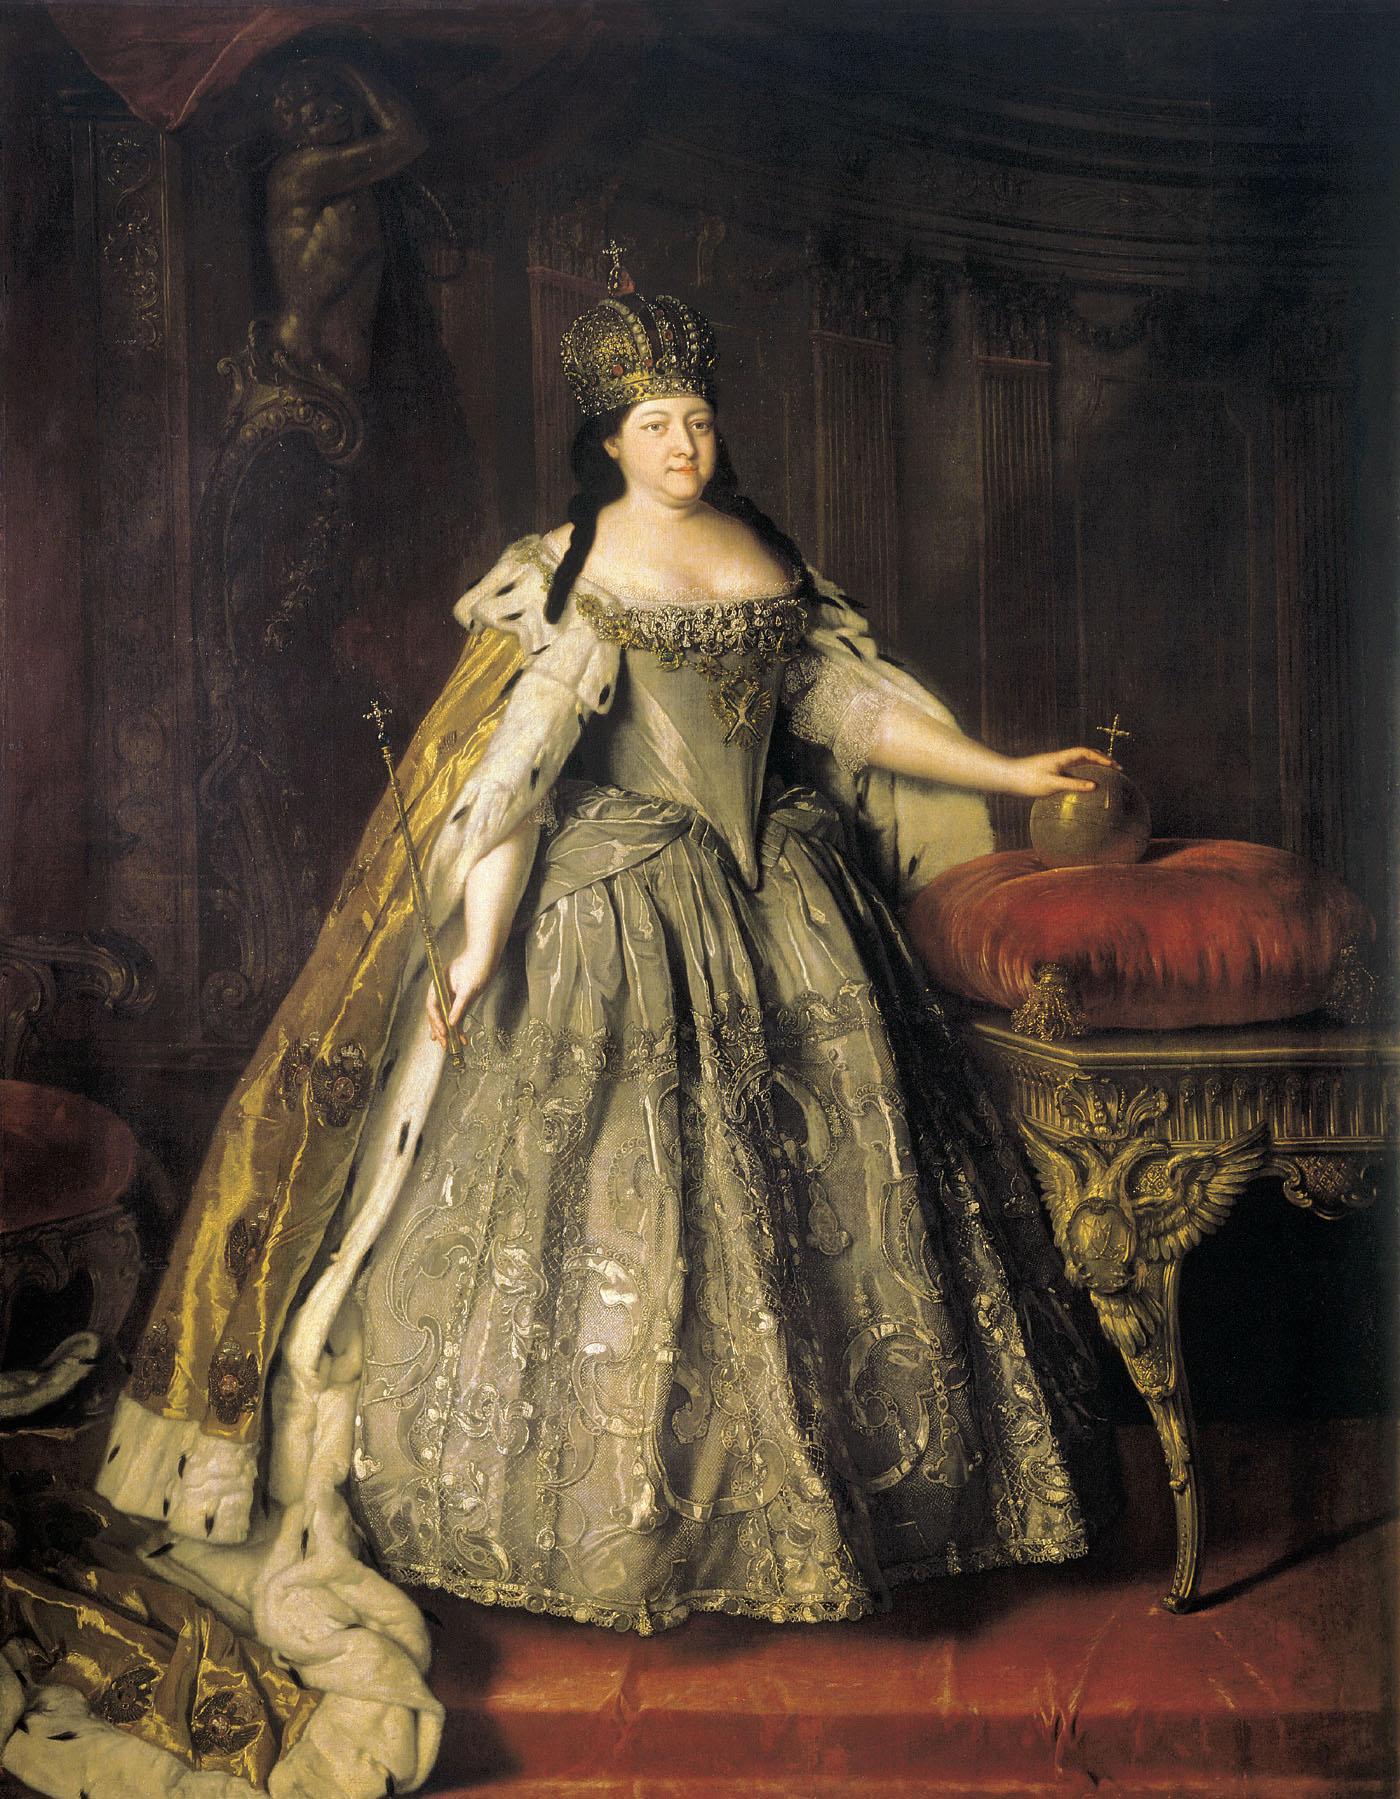 louis_caravaque_portrait_of_empress_anna_ioannovna_1730.jpg